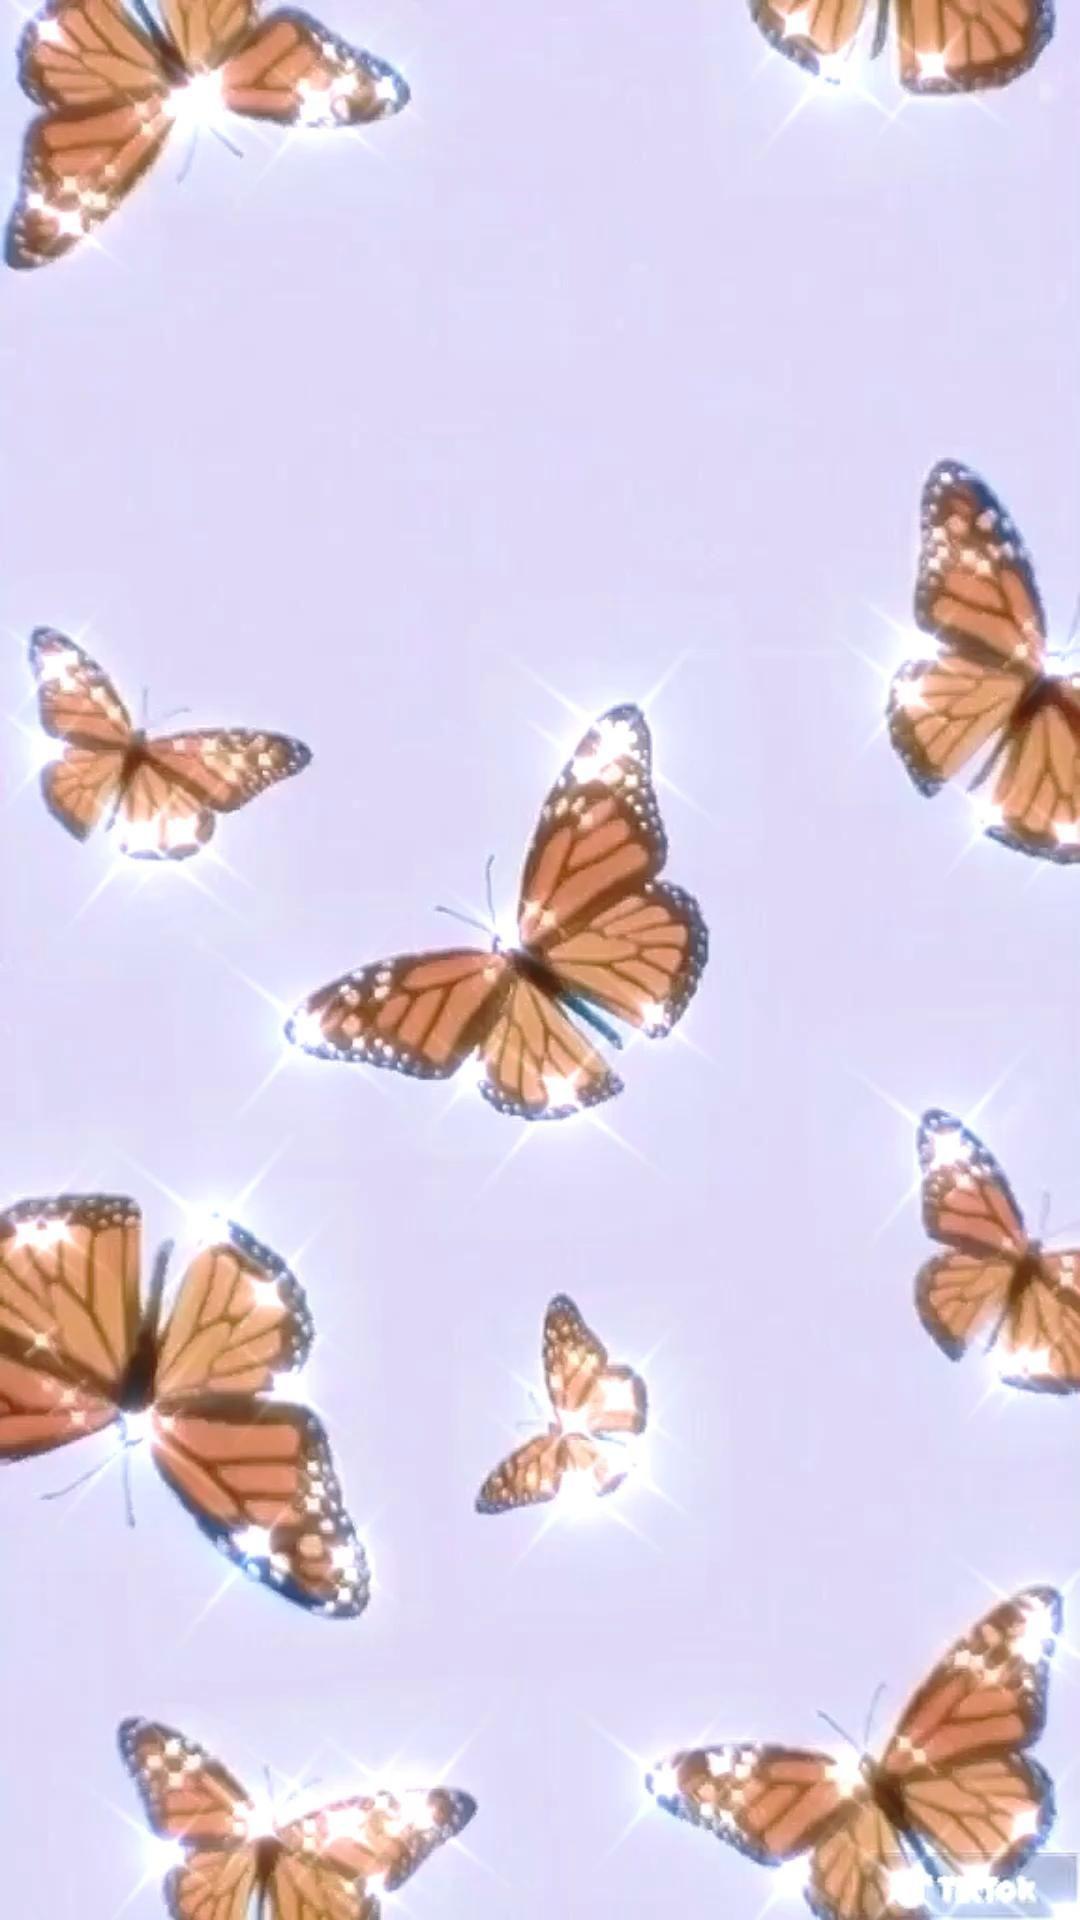 Fond Ecran In 2020 Wallpaper Butterfly Wallpaper Iphone Iphone Wallpaper Tumblr Aesthetic